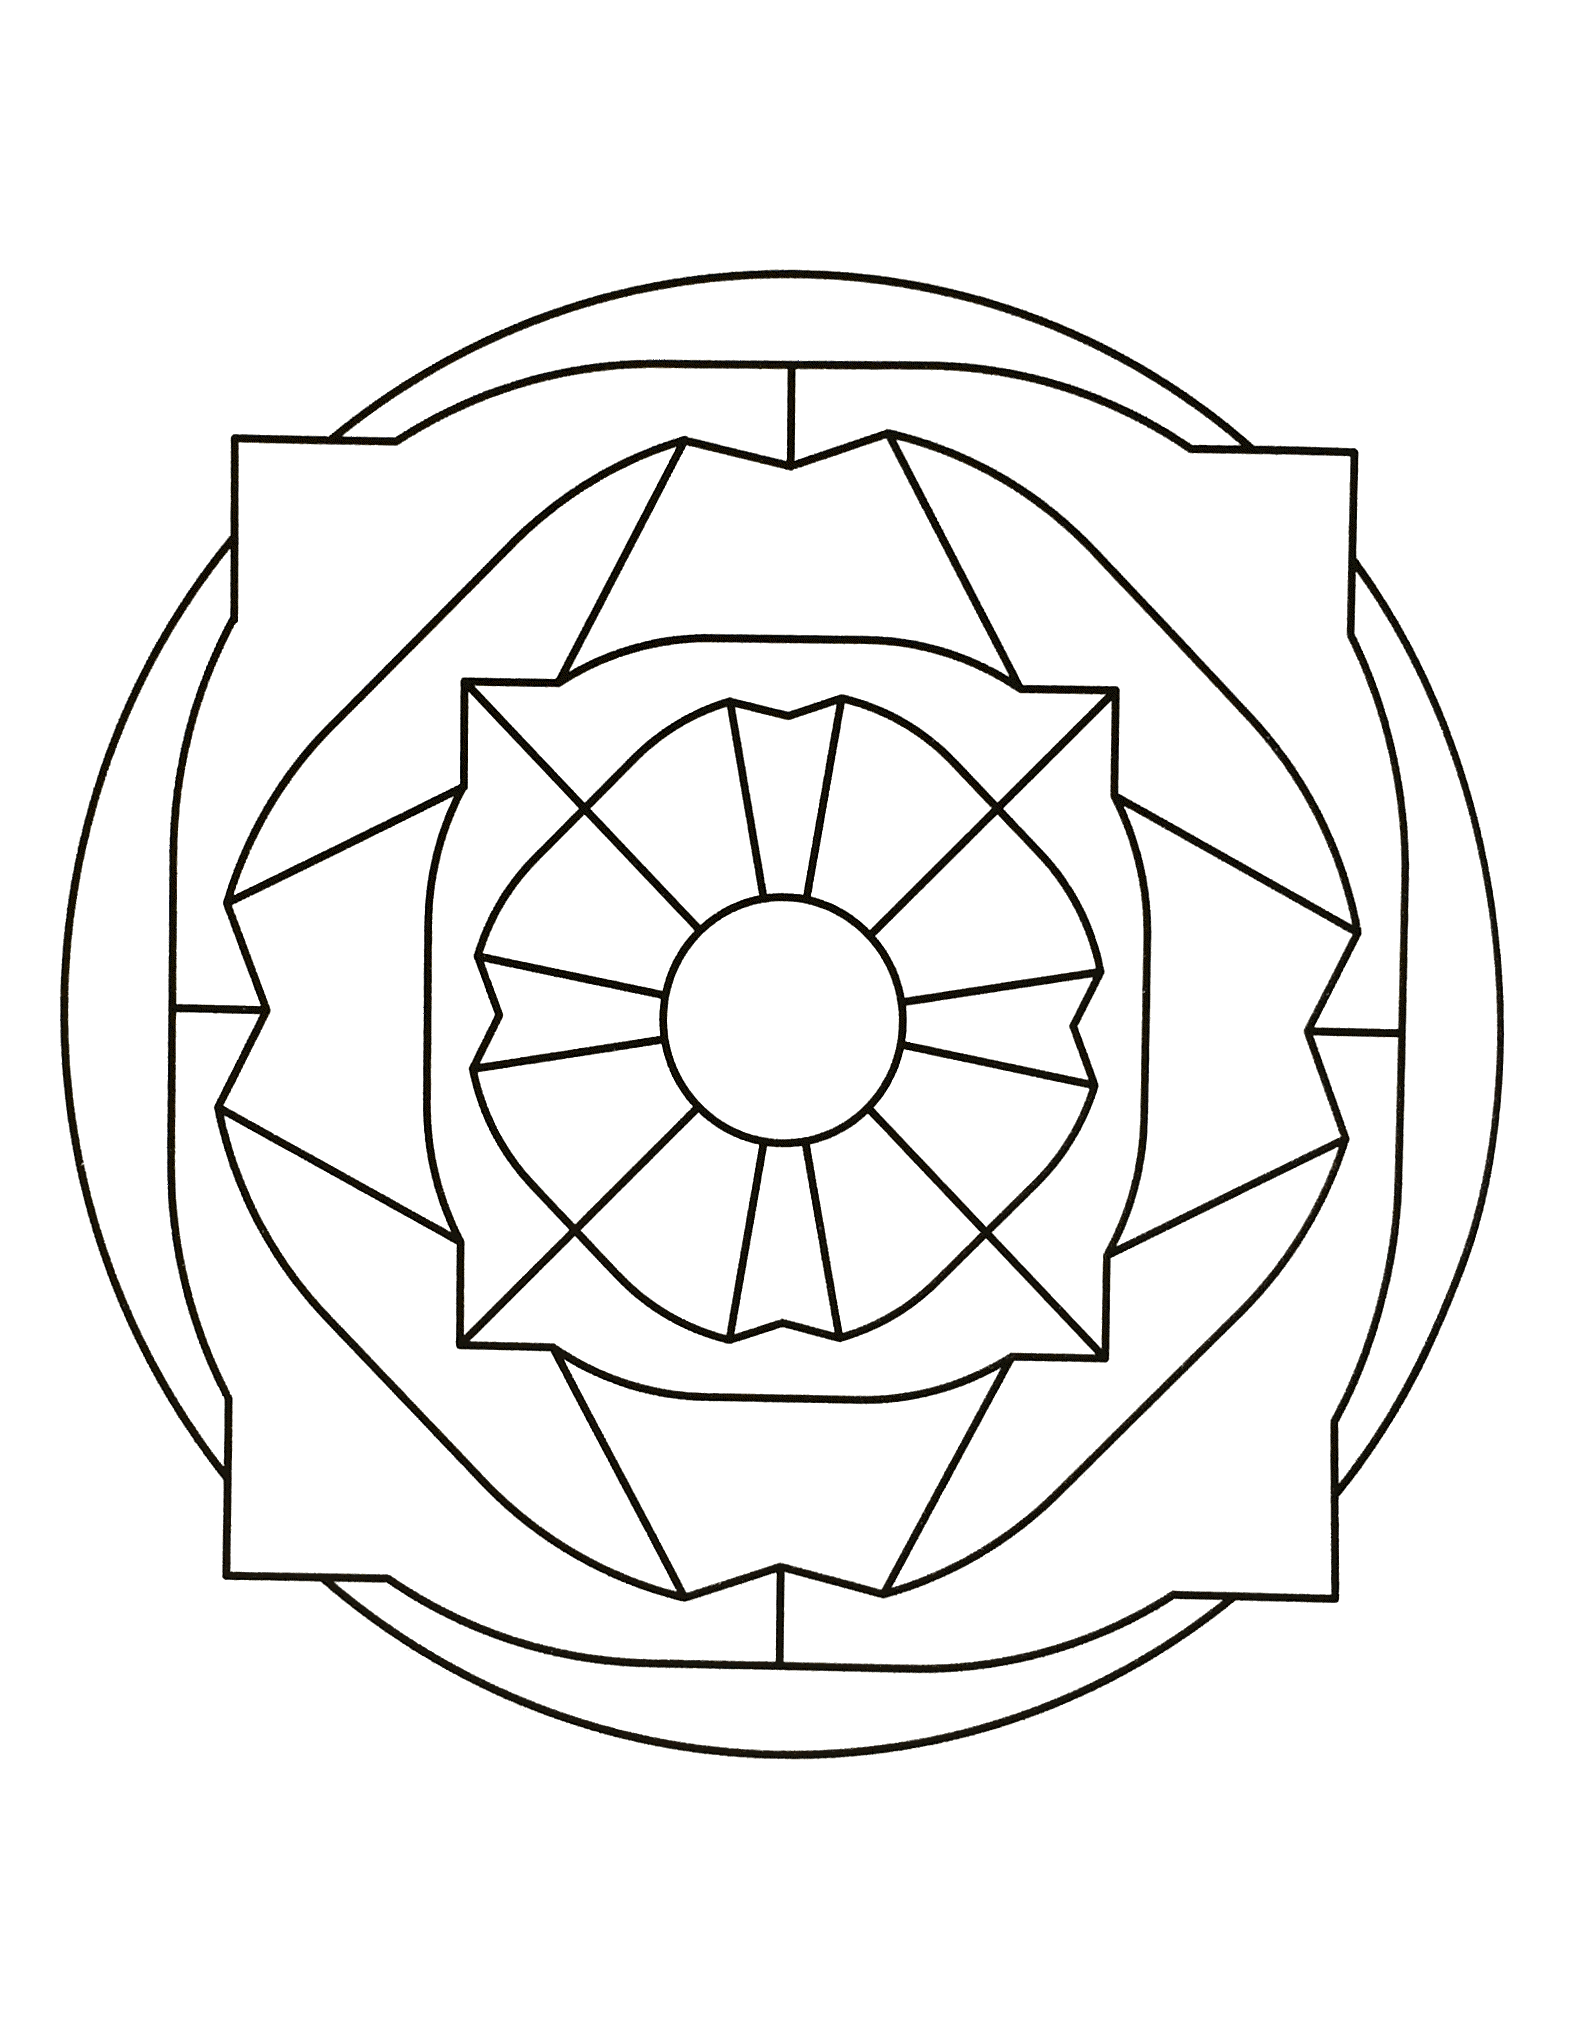 Mandalas to print free 16